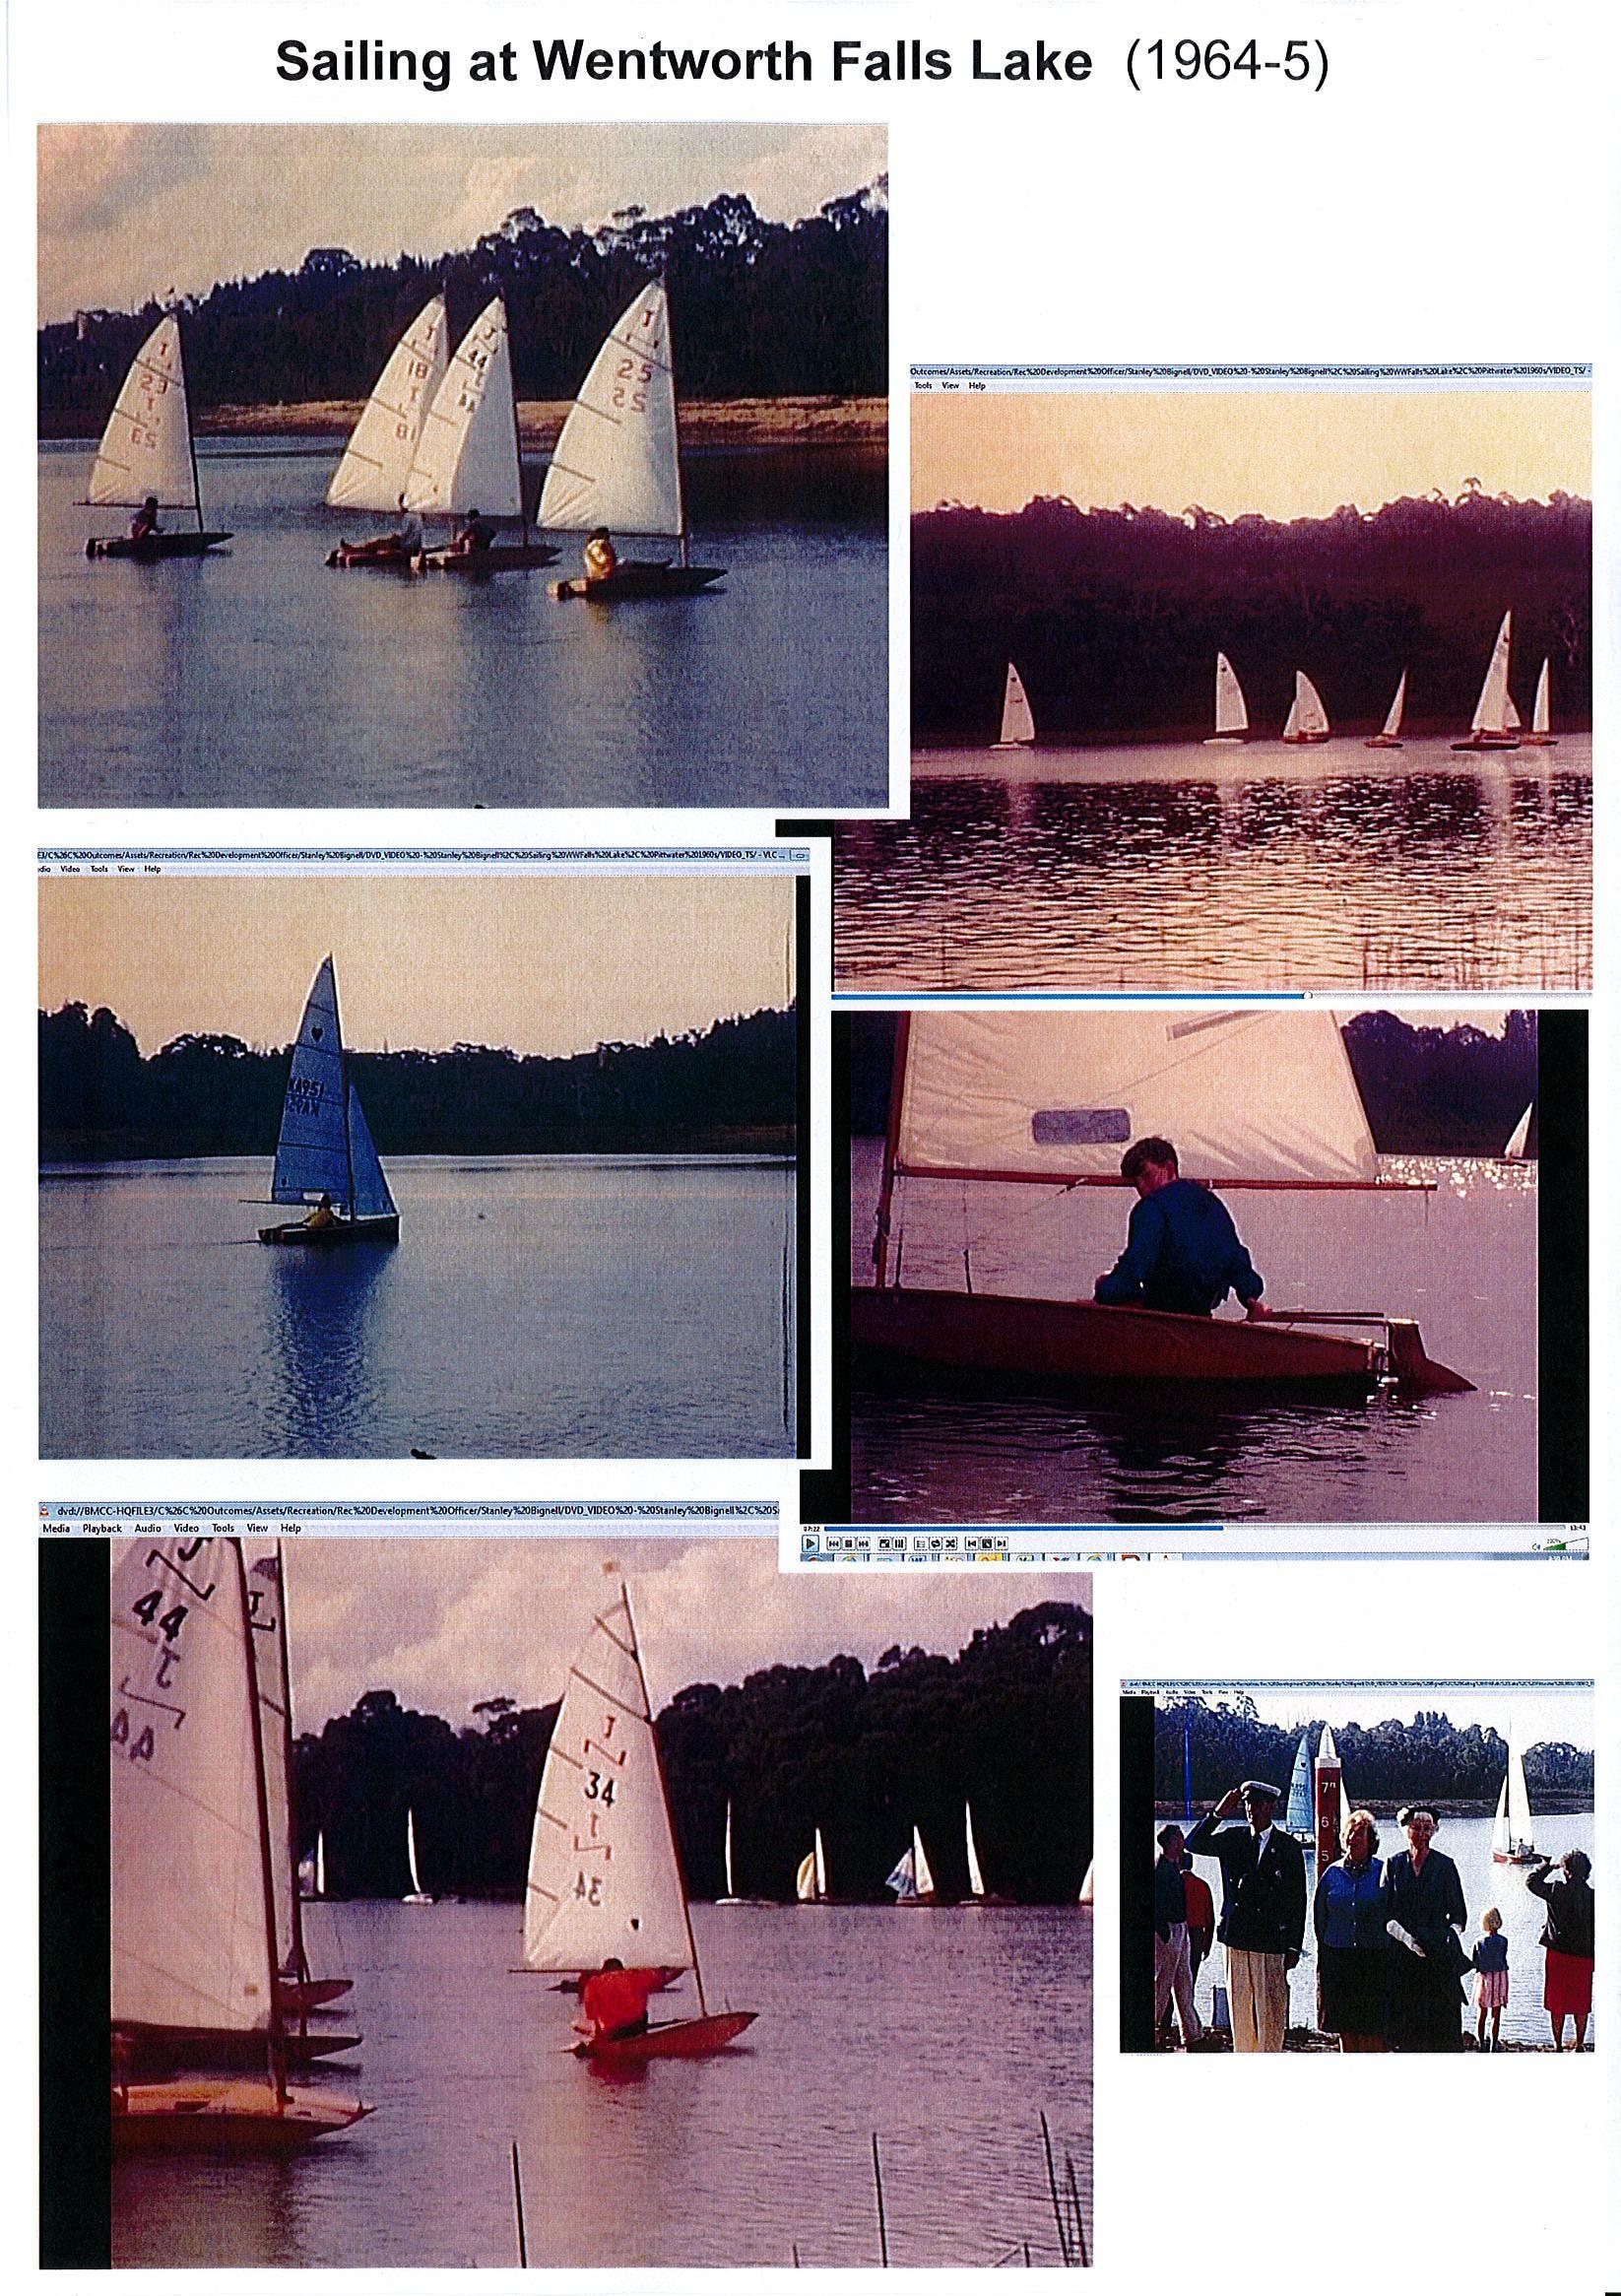 Sailing Pics Ww Falls Lake Stanley Bignell 1